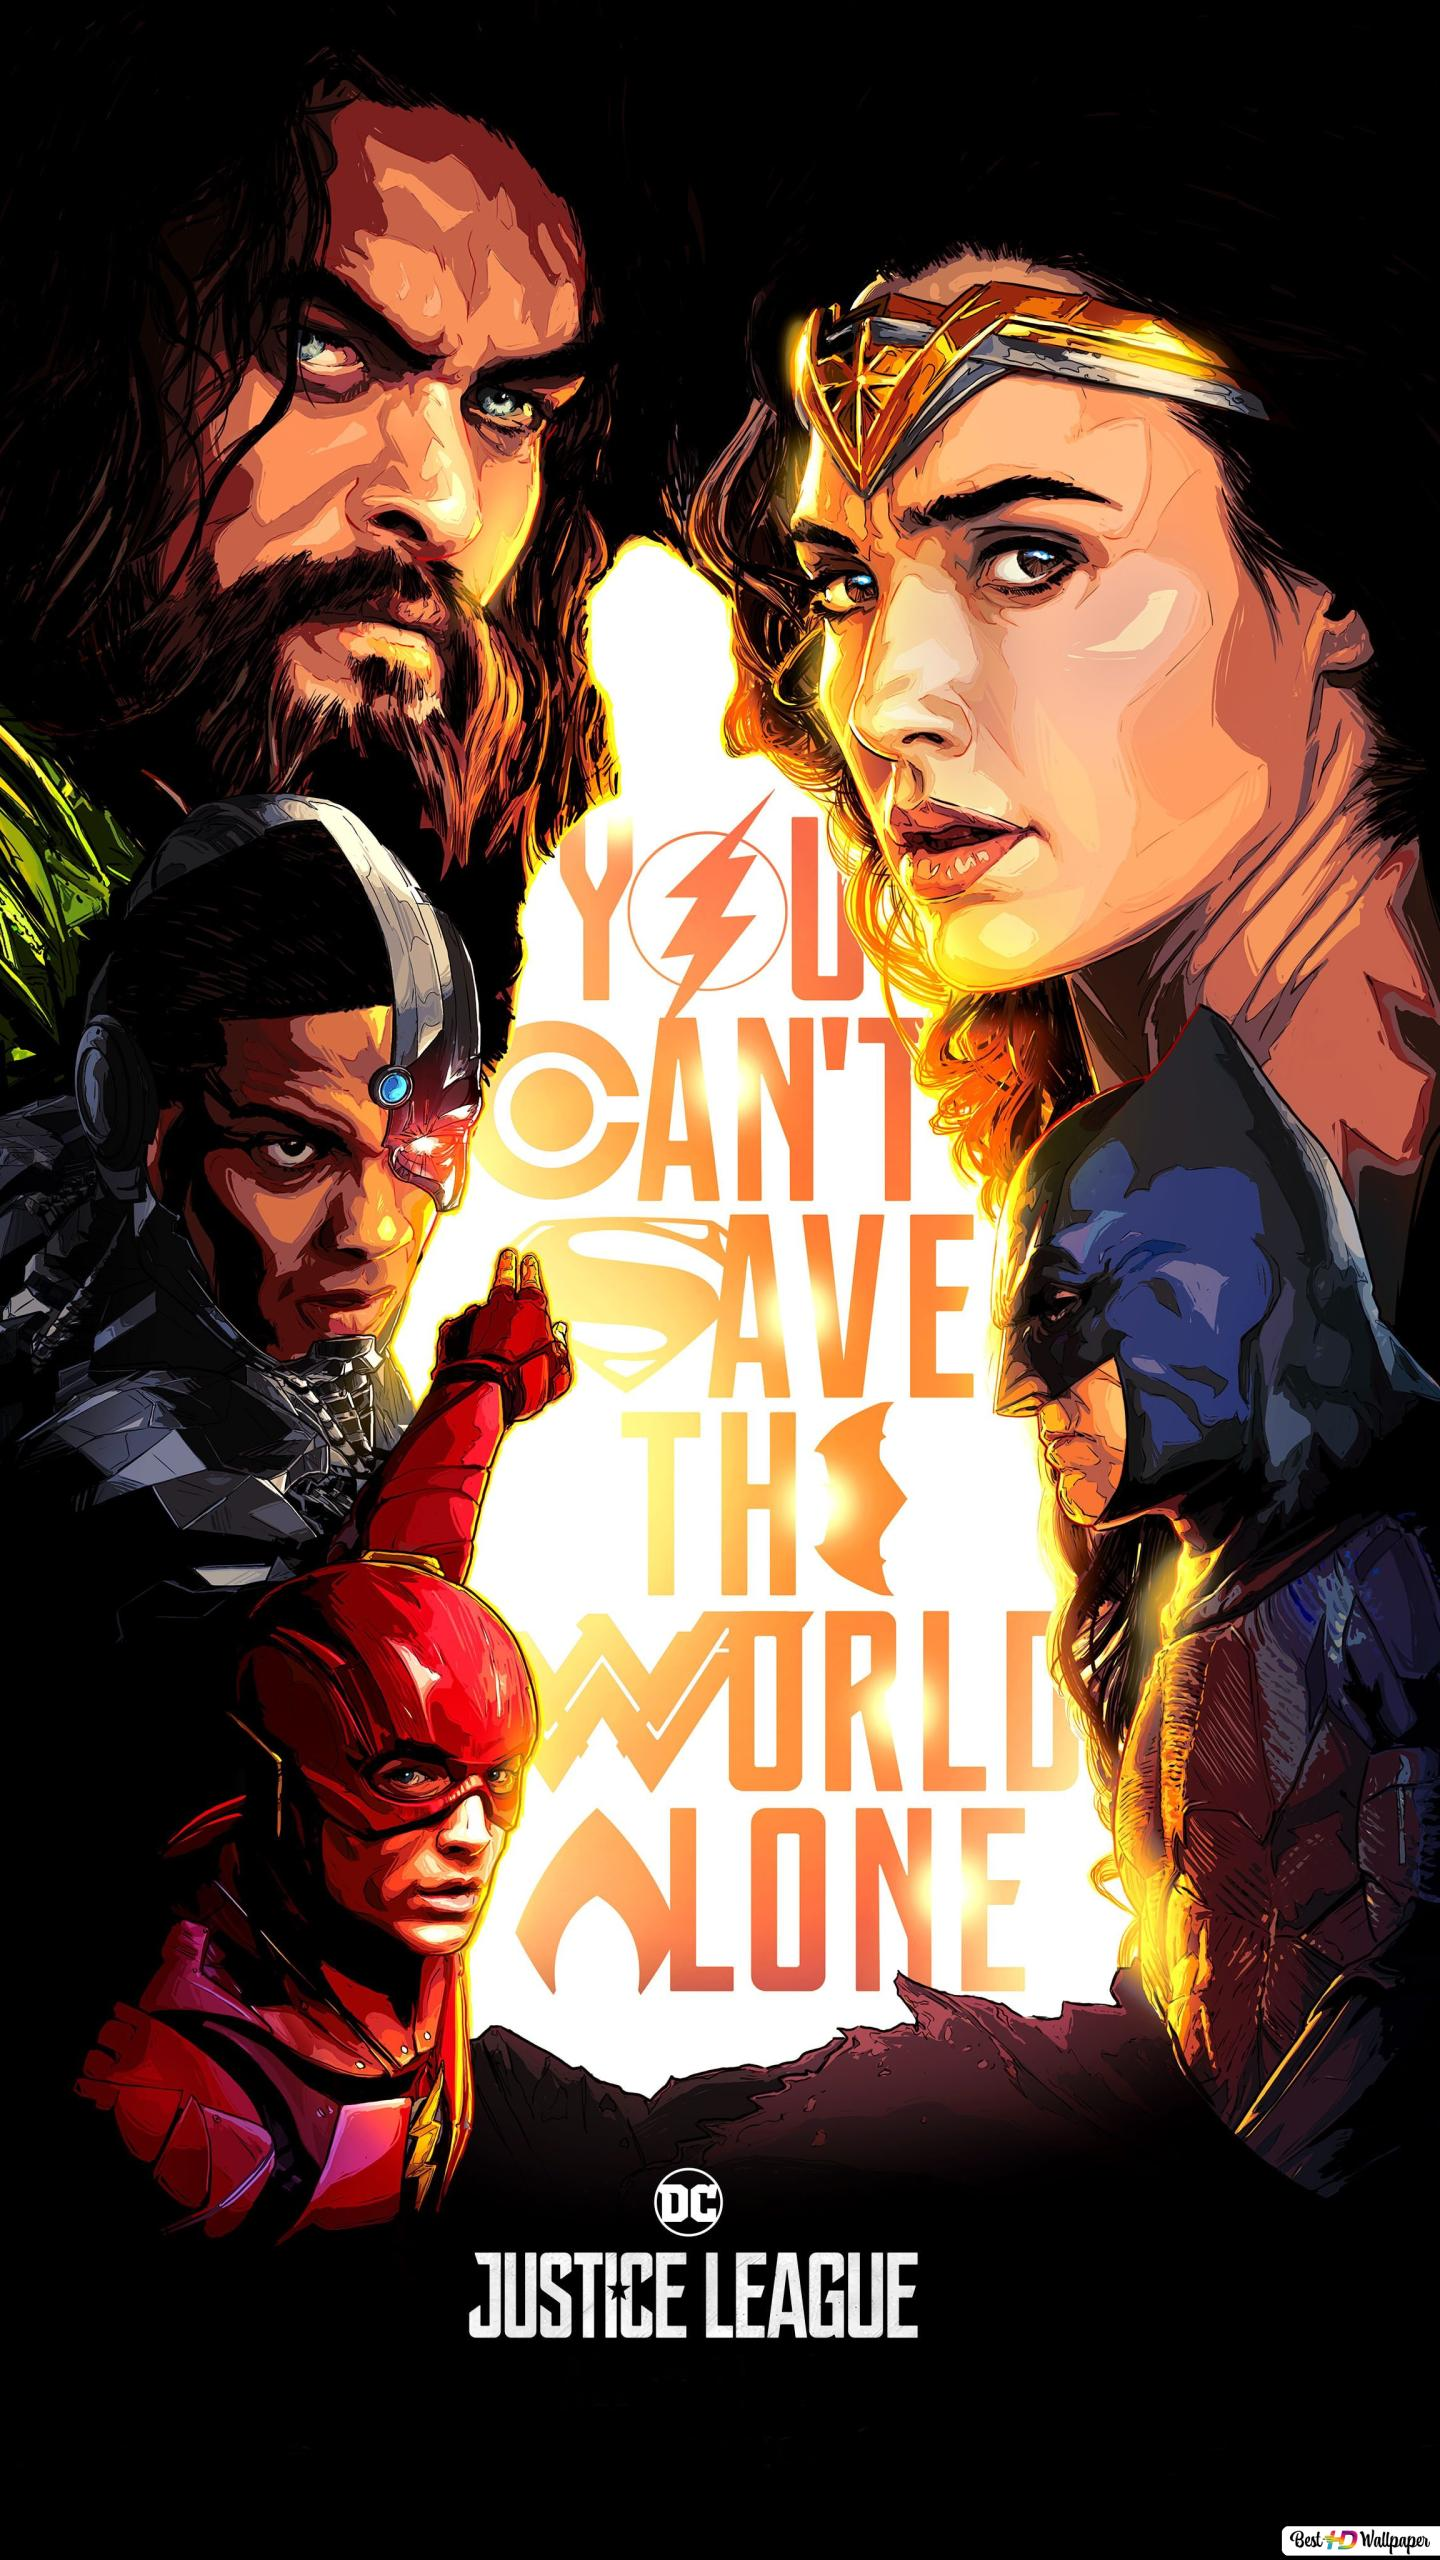 Justice League Movie Comic Heroes Hd Wallpaper Download